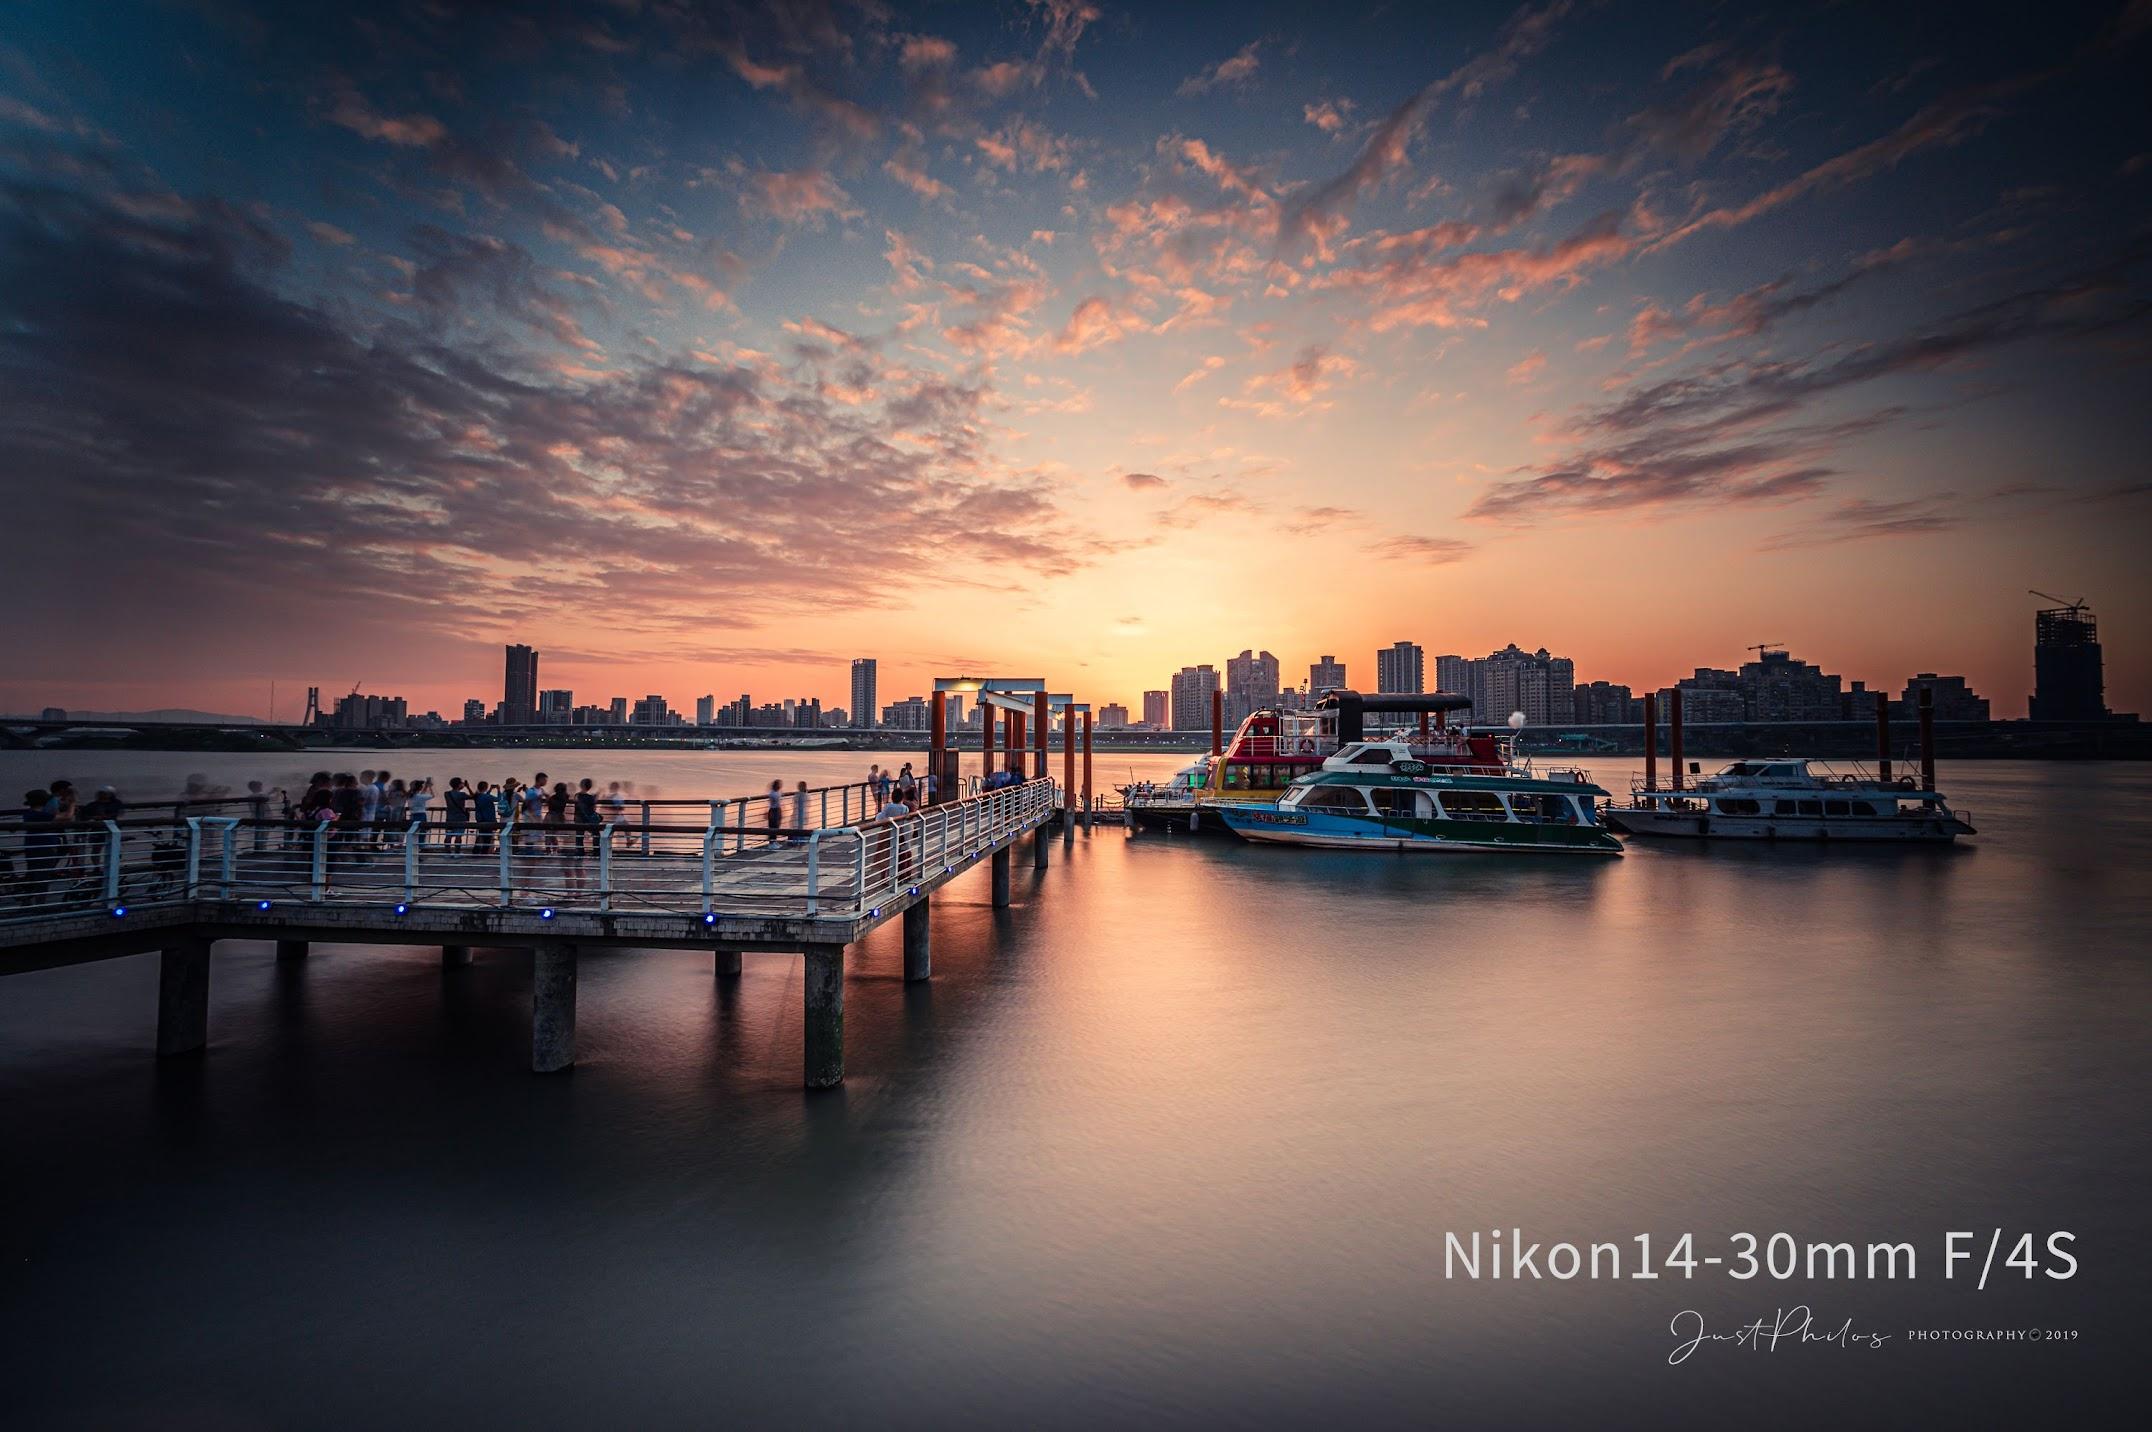 NIKON Z6+NIKON 14-30MM F/4S   f/8.0 13s ISO100 台北大稻埕碼頭夕陽,14mm超廣角鏡拍攝風景的張力非常令人驚艷。